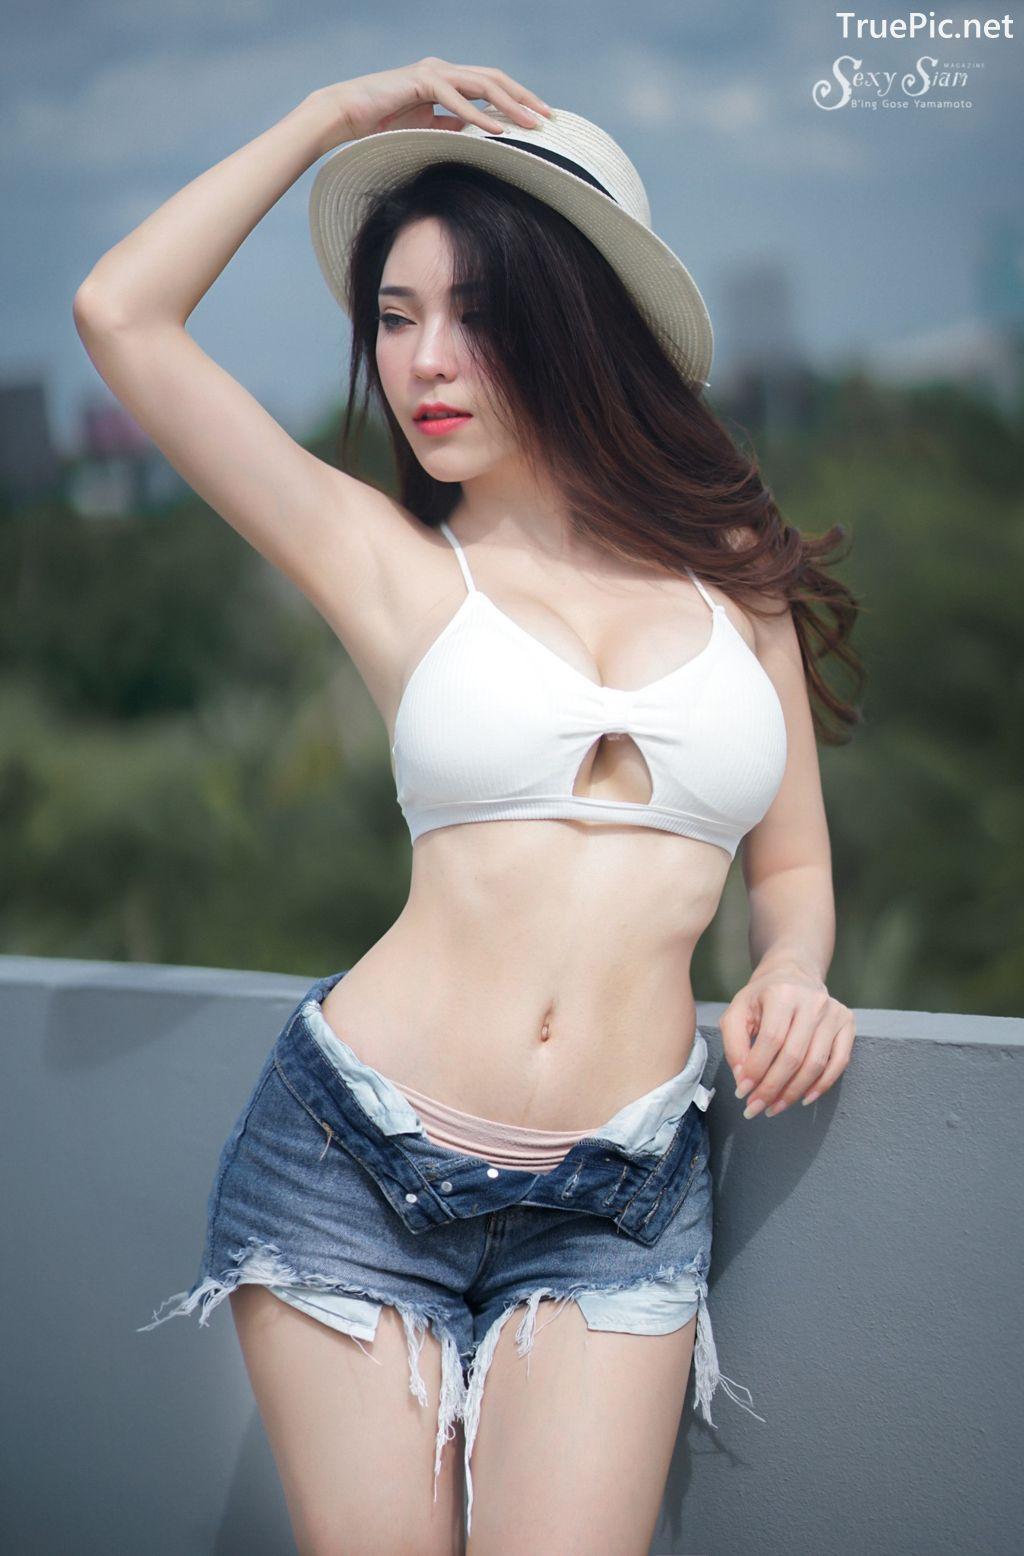 Image-Thailand Sexy Model-Janet-Kanokwan-Saesim-White-Bra-And-Jean-TruePic.net- Picture-1